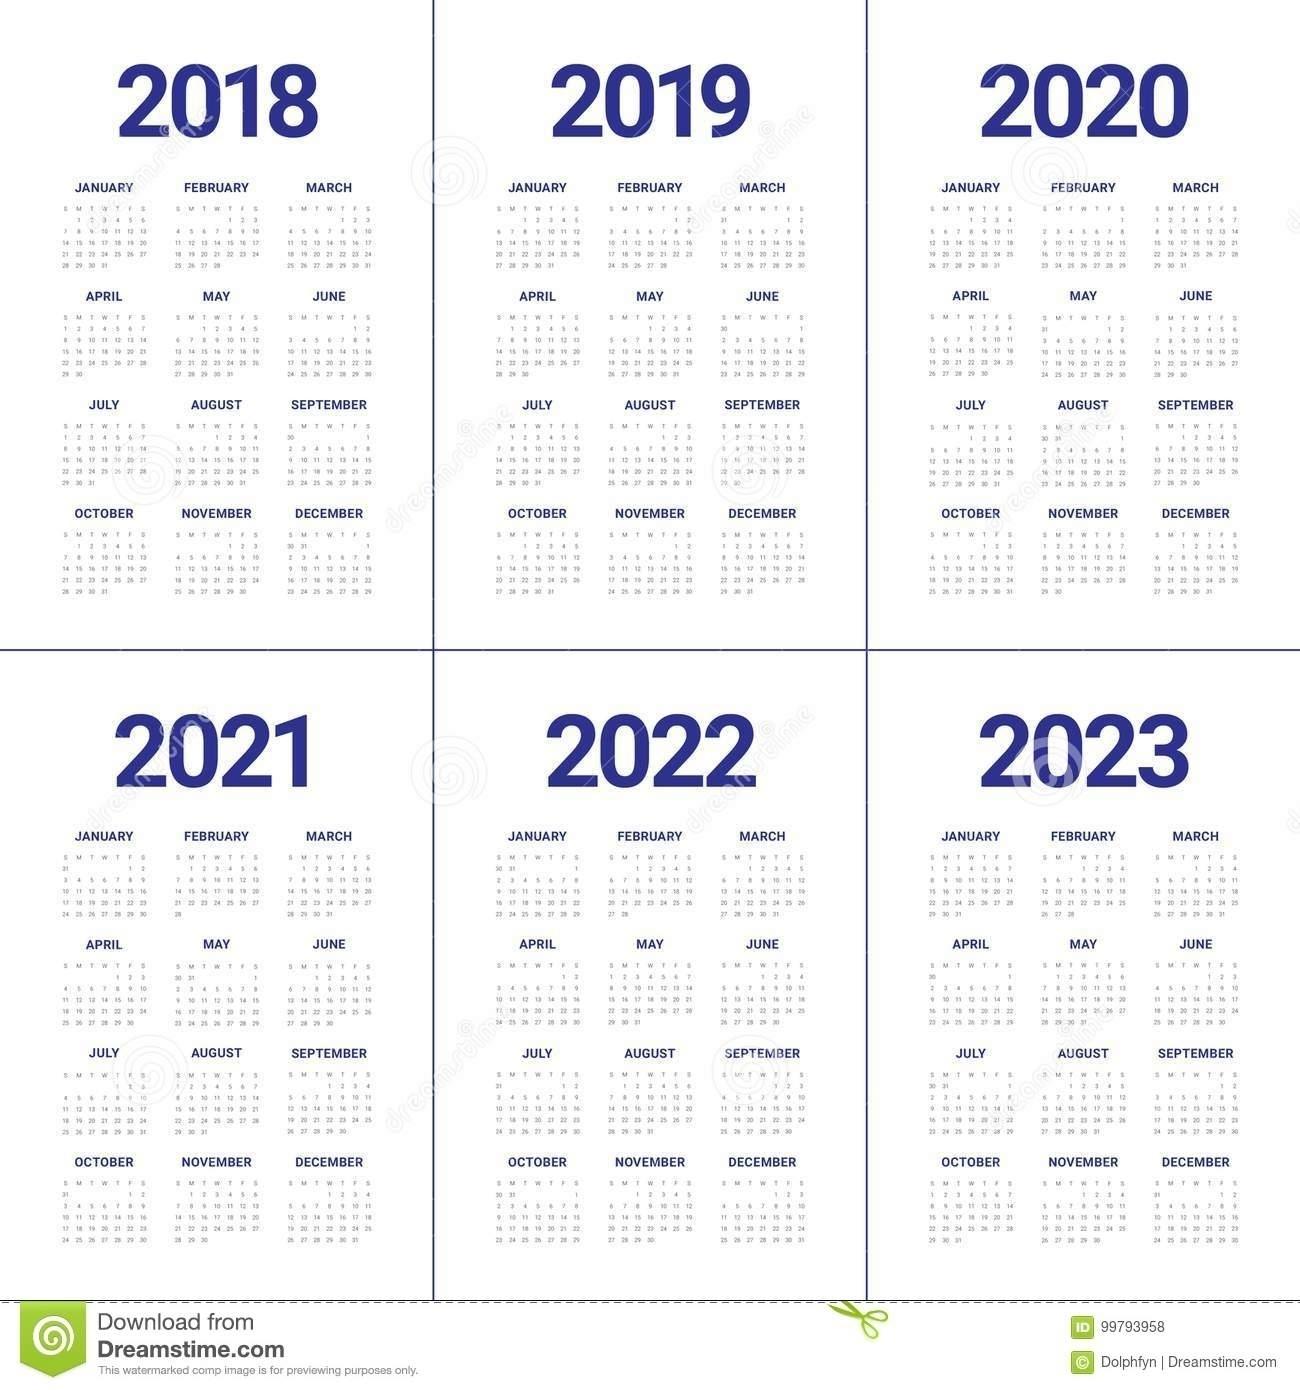 Print 2019, 2020, 2021, 2022, 2023, Calender - Calendar Inspiration Design